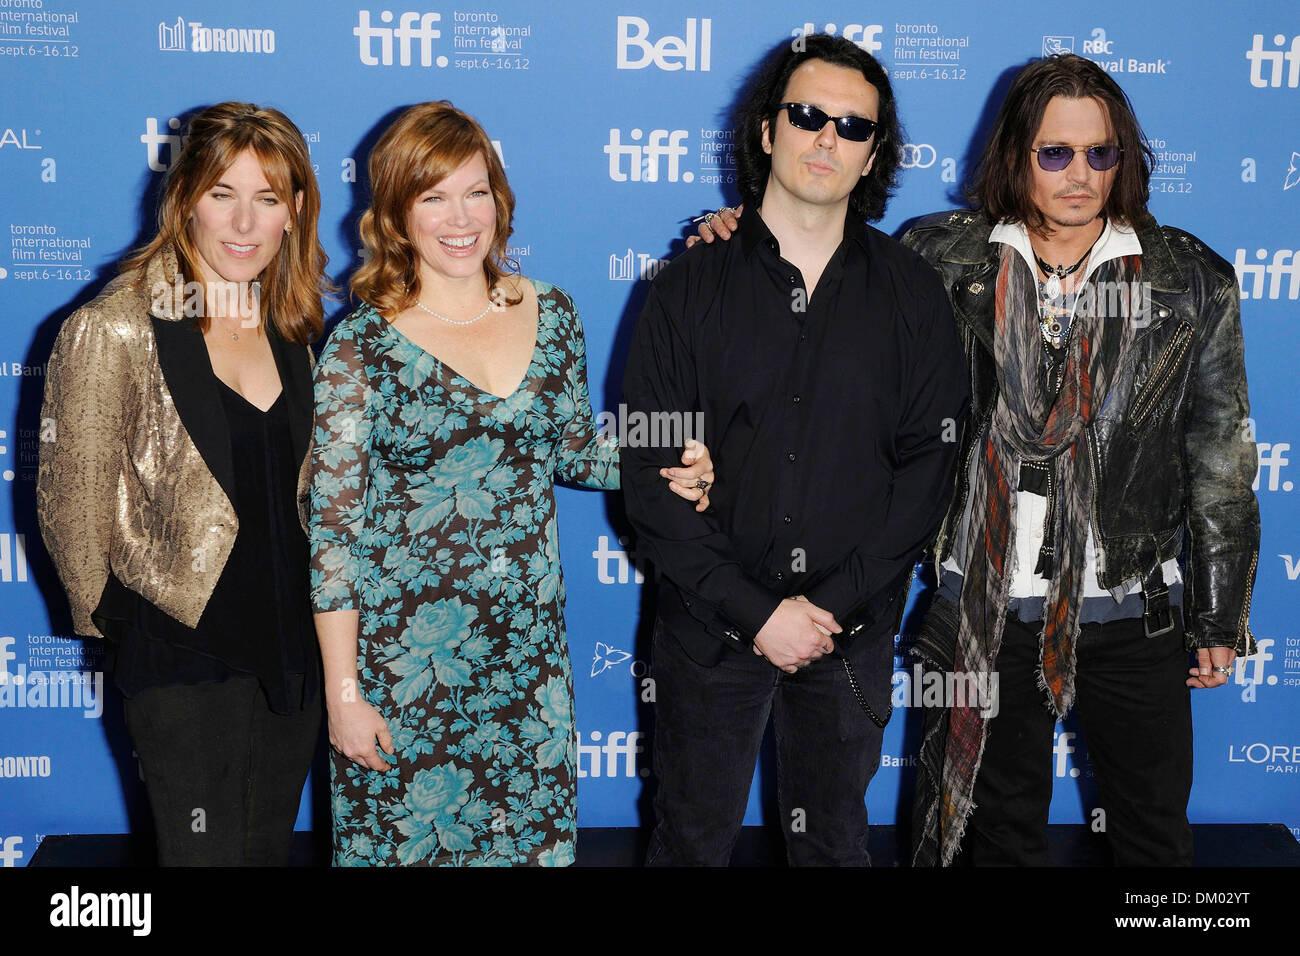 Amy Berg Lorri Davis Damien Echols And Johnny Depp 2012 Toronto Stock Photo Alamy